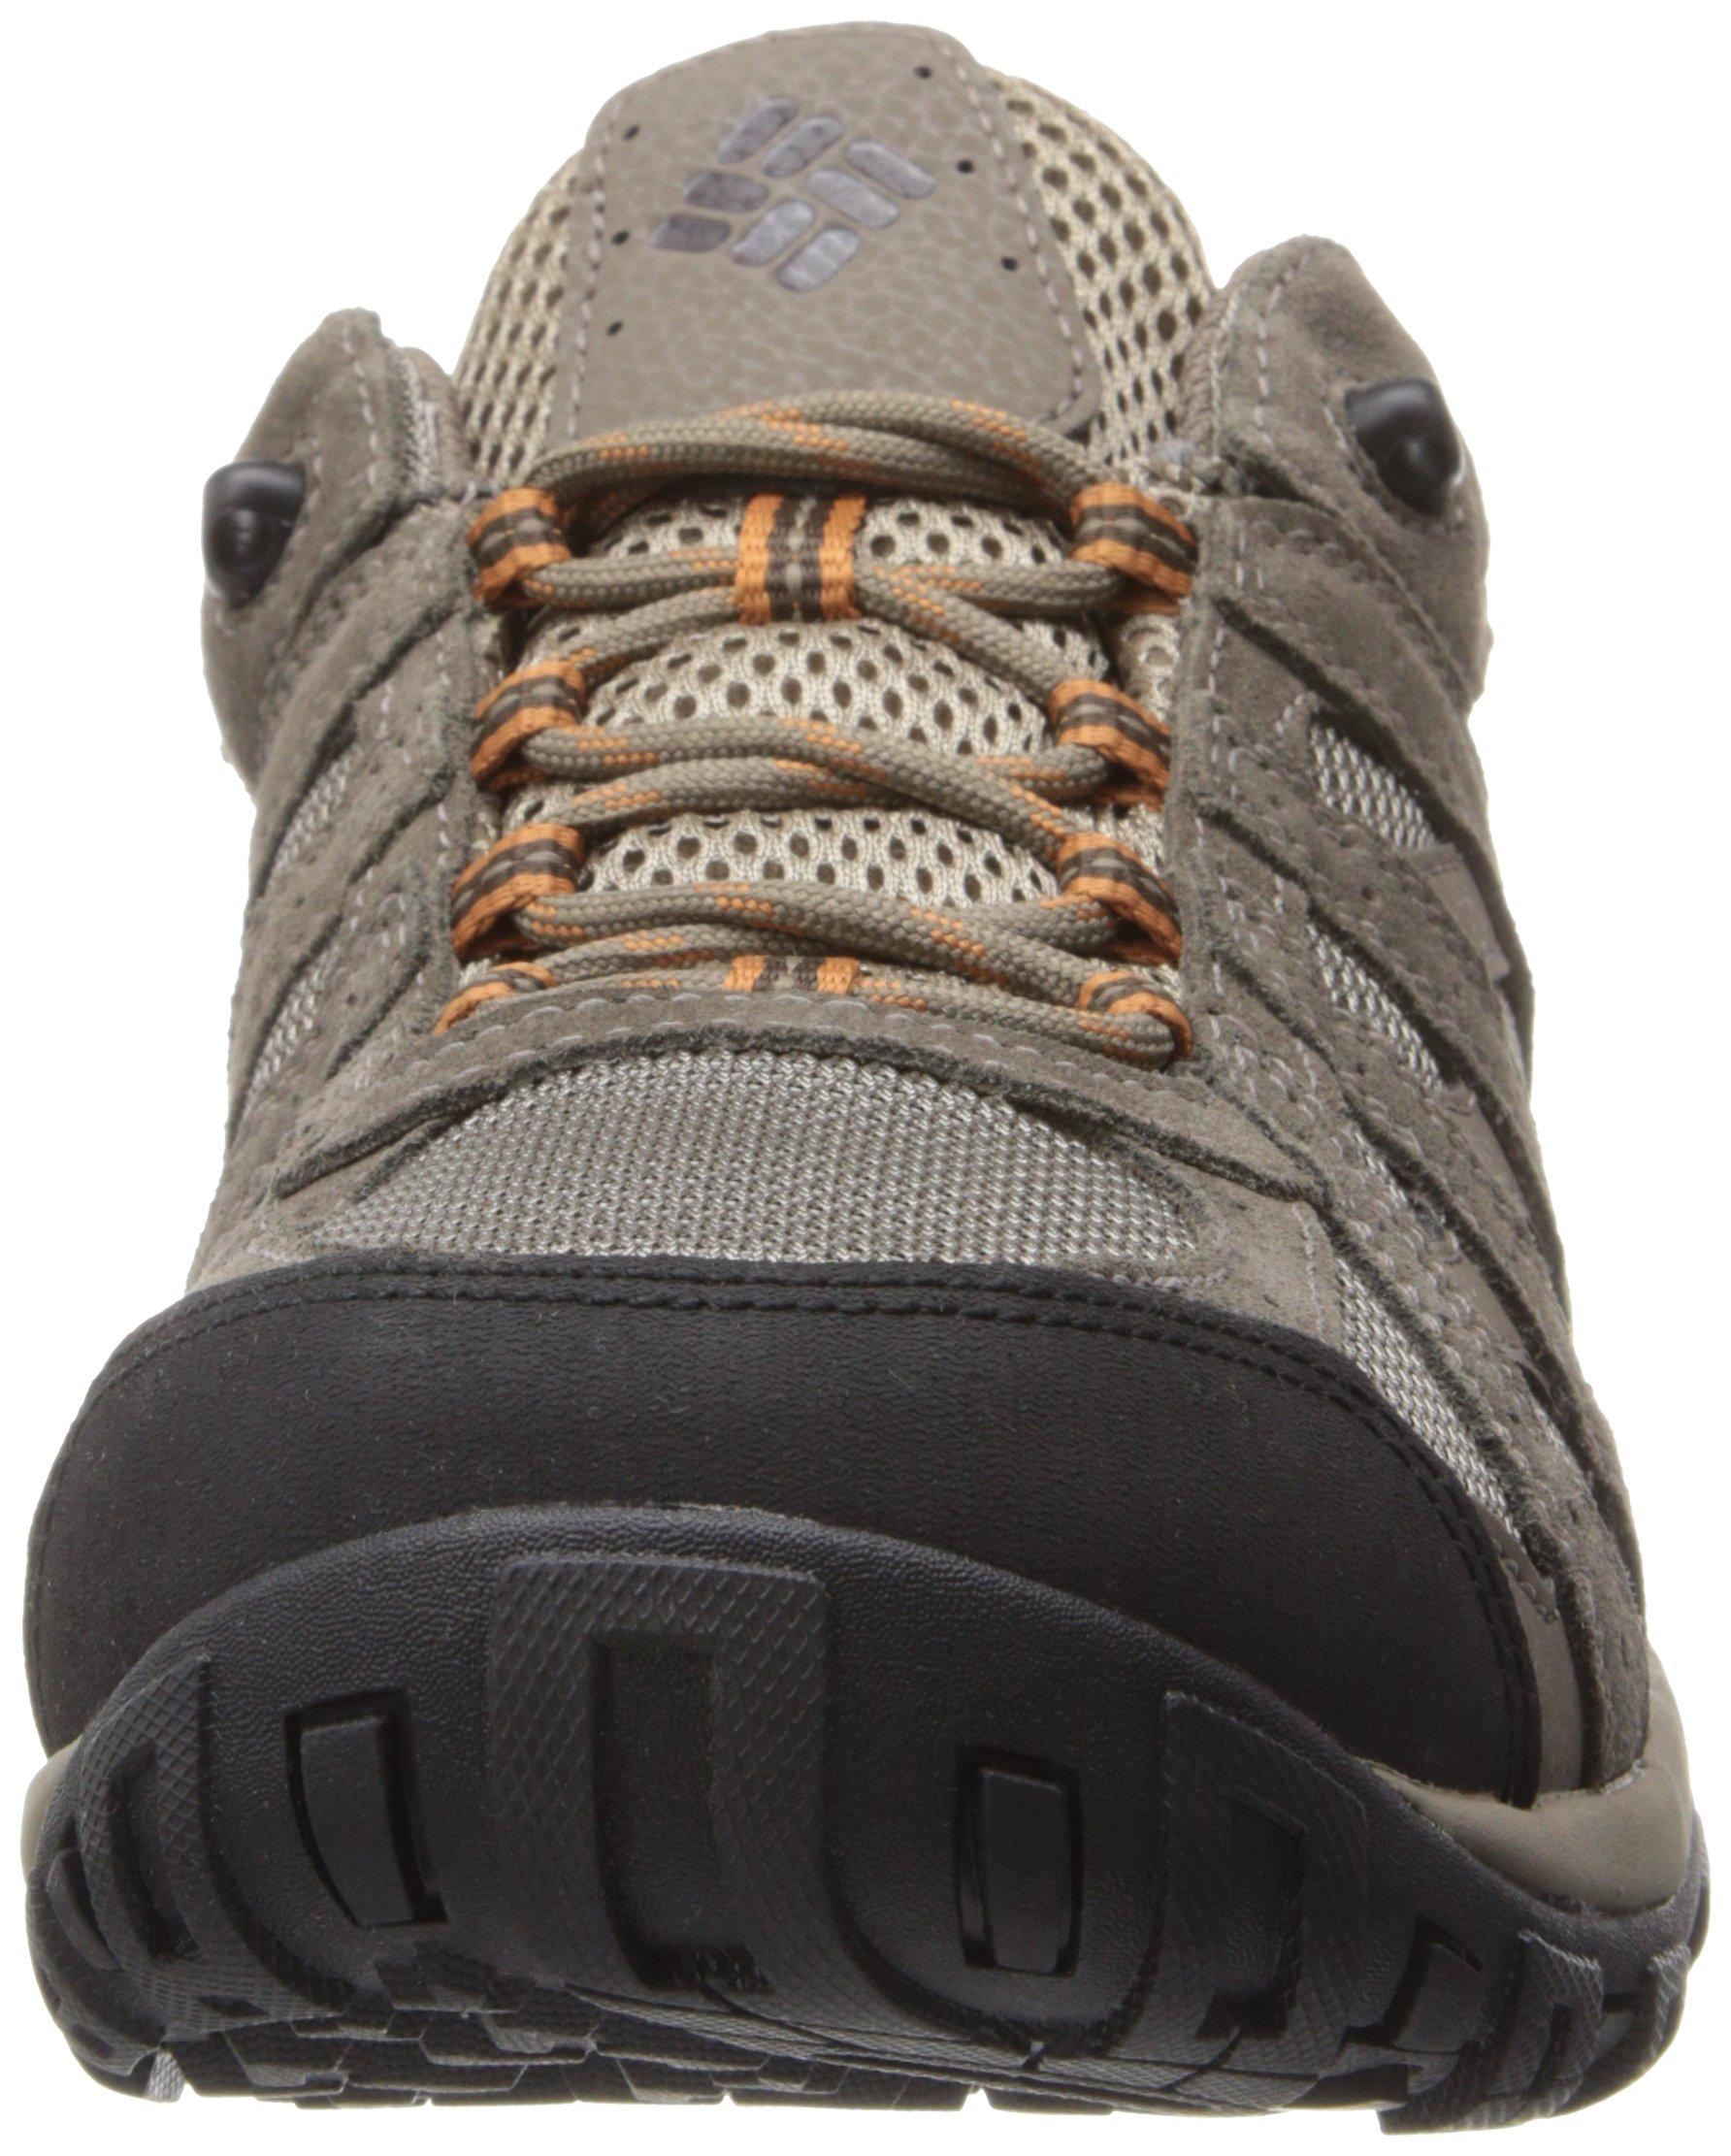 Columbia Men's Redmond Waterproof Hiking Shoe Pebble, Dark Ginger 7 D US by Columbia (Image #4)